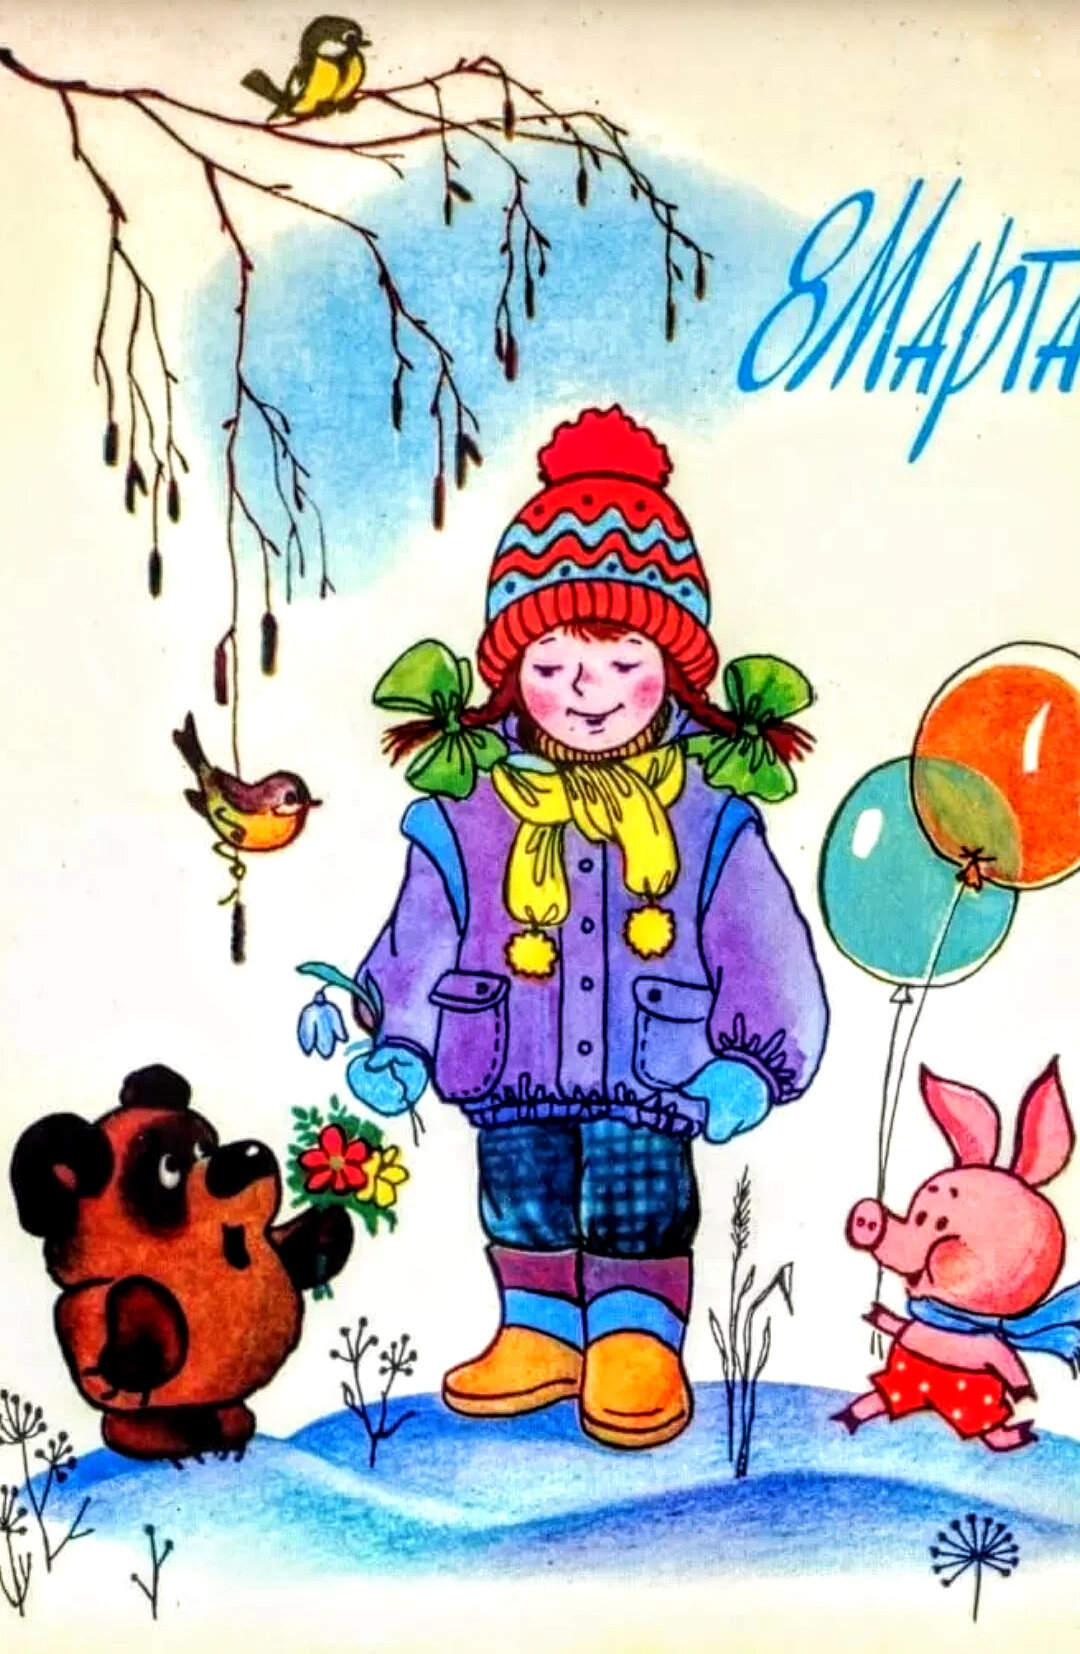 Антистресс, открытки советских времен с 8 марта